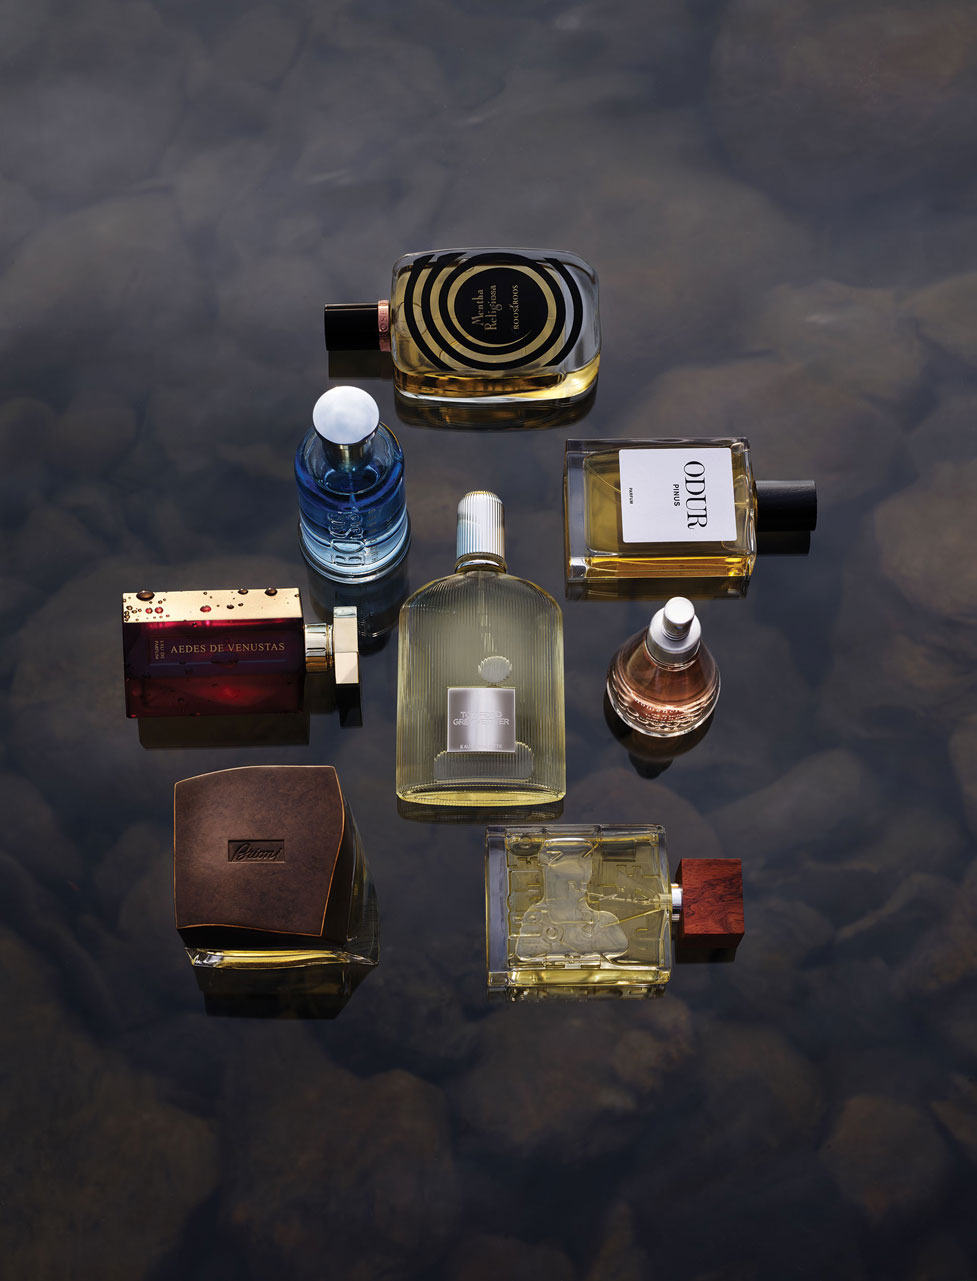 180811_Bloomberg_perfume4021FinalToSend